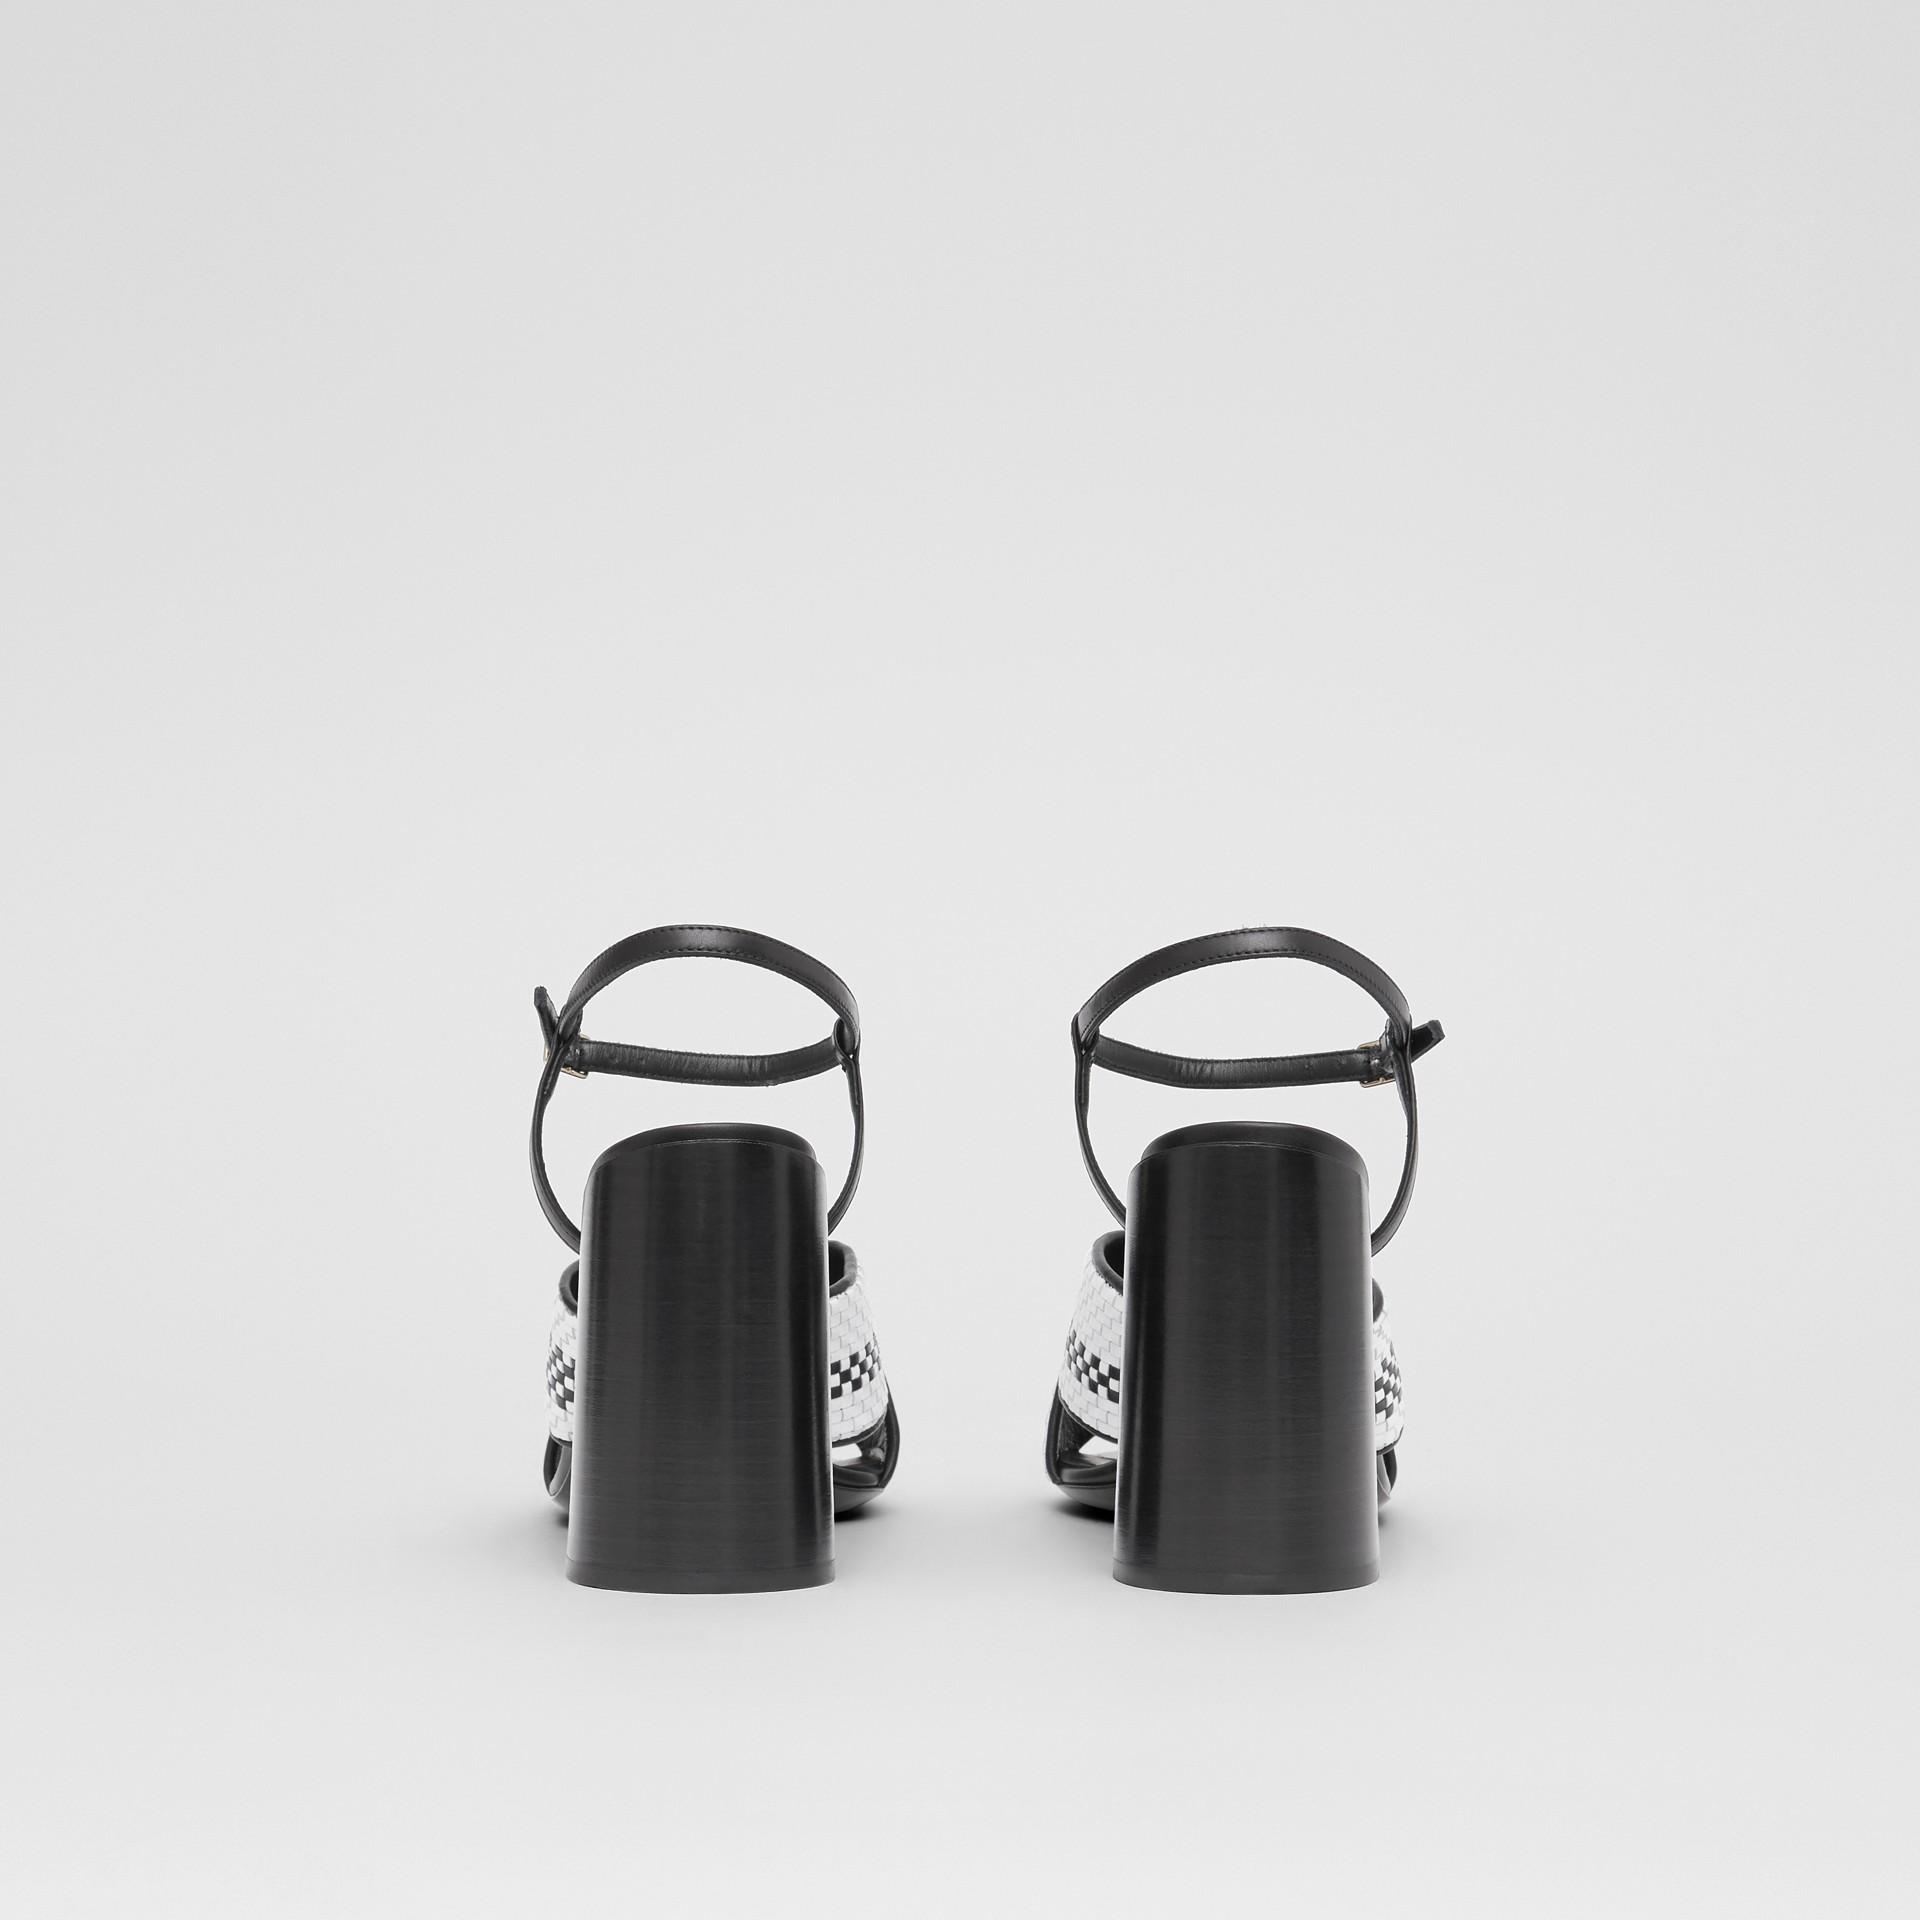 Latticed Leather Block-heel Sandals in Black/white - Women | Burberry - gallery image 4